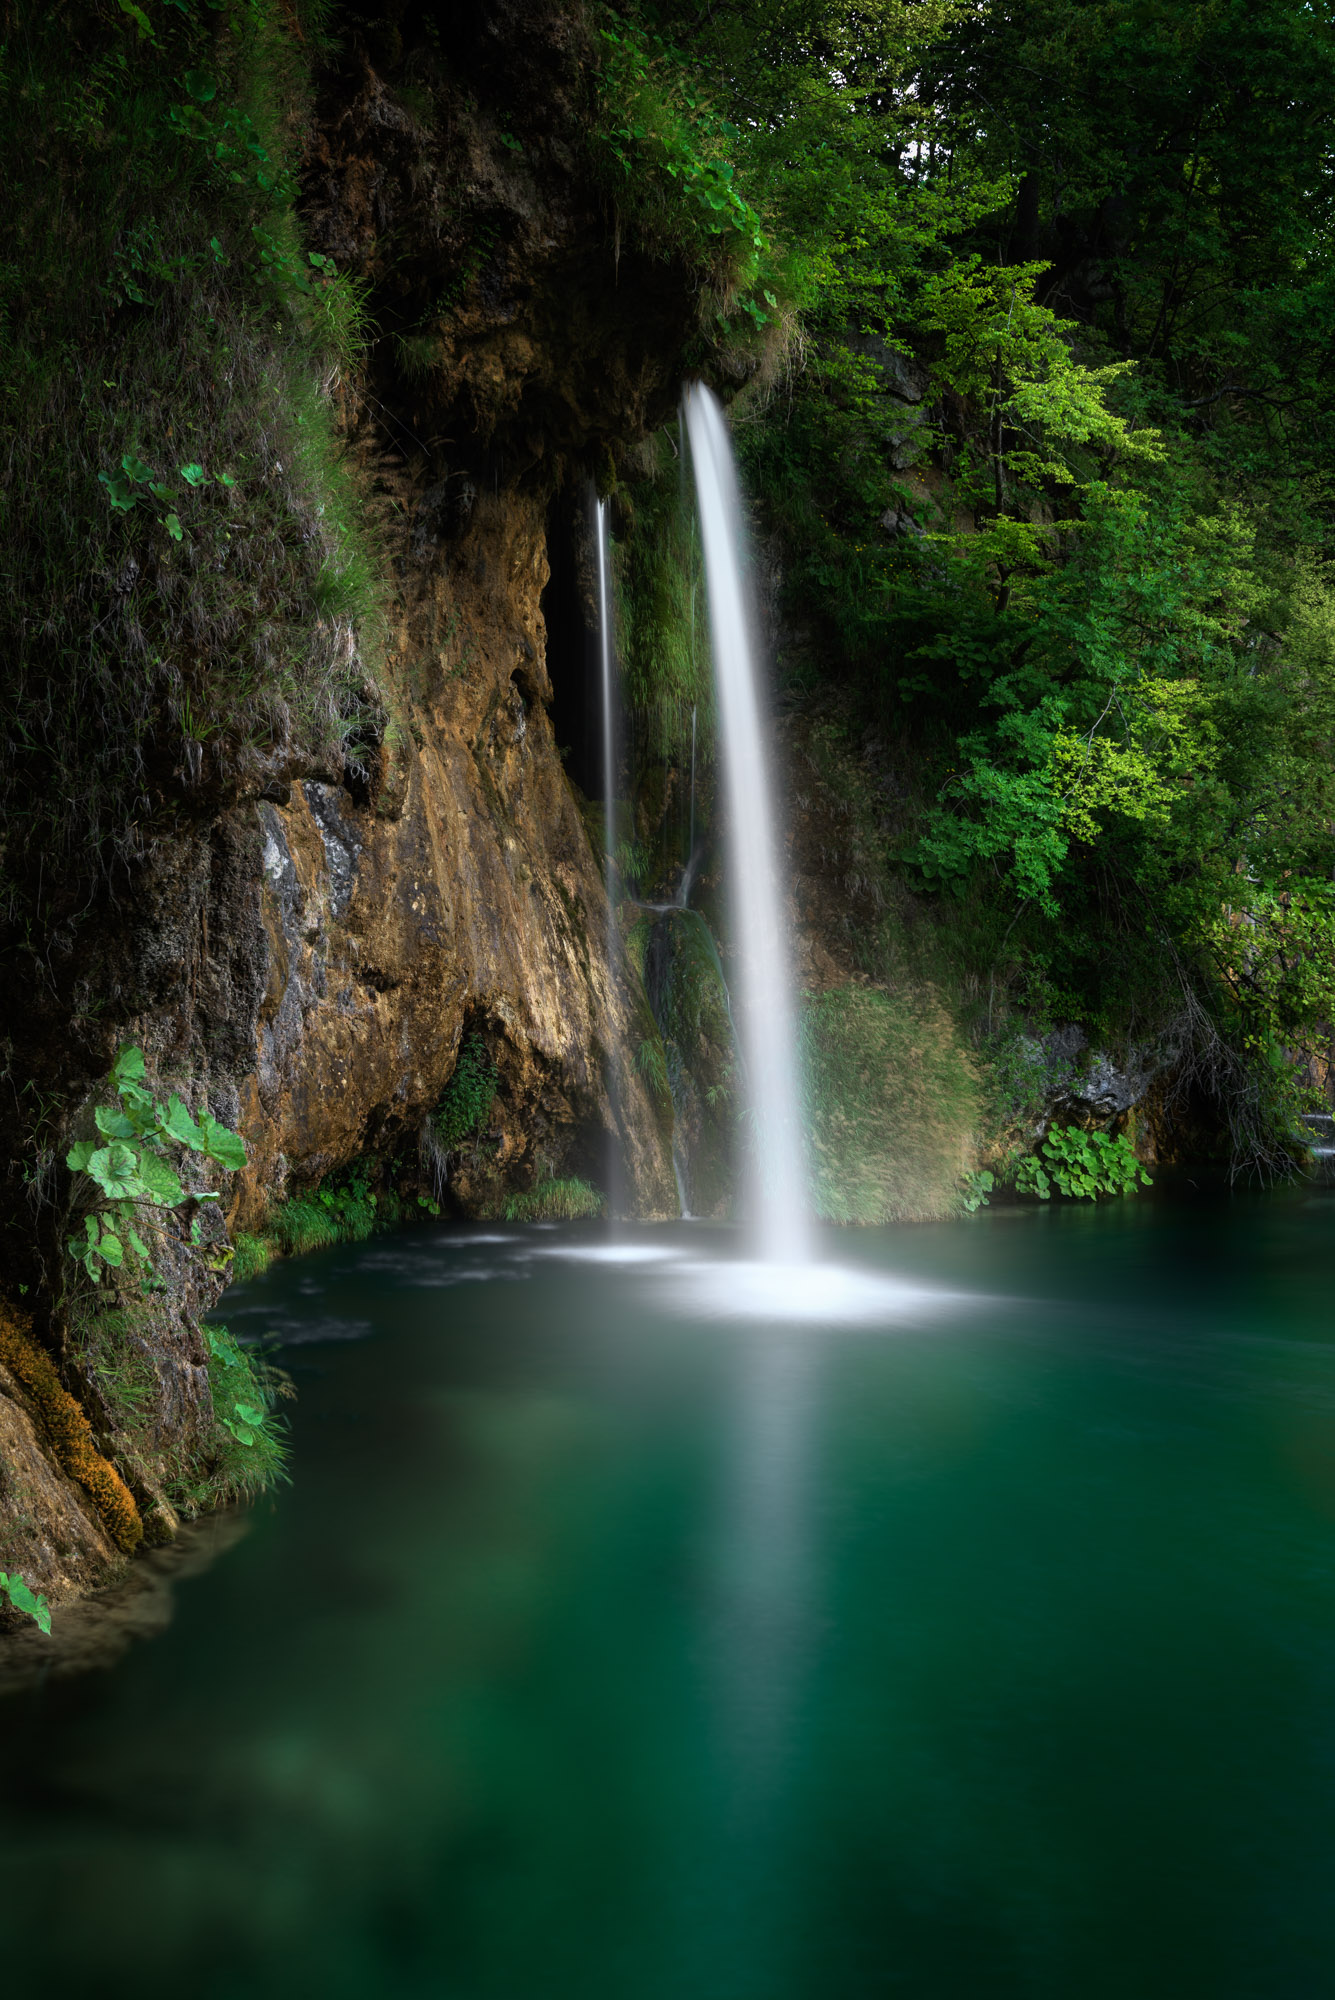 Small Waterfall at Plitvice Lakes National Park, Croatia